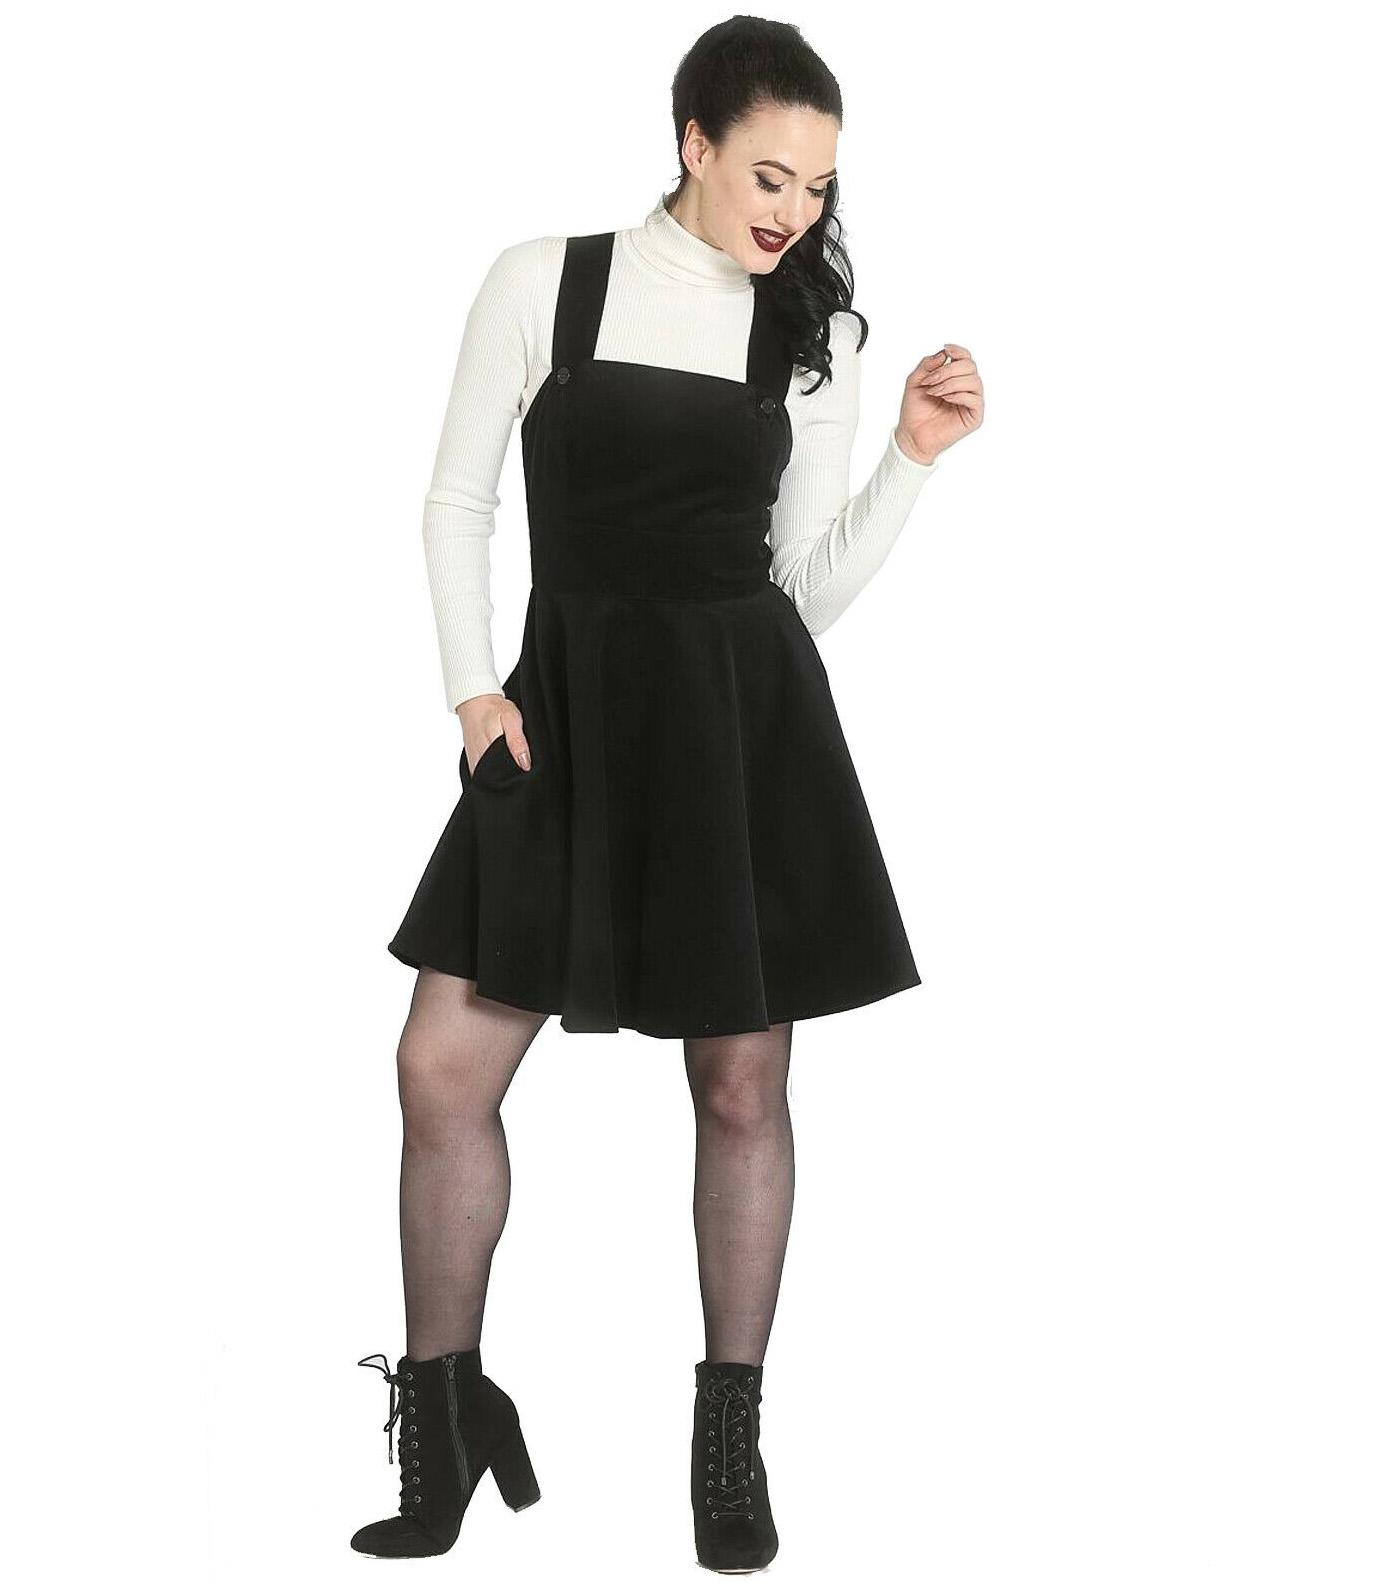 Hell-Bunny-Rockabilly-Corduroy-Mini-Dress-WONDER-YEARS-Pinafore-Black-All-Sizes thumbnail 3